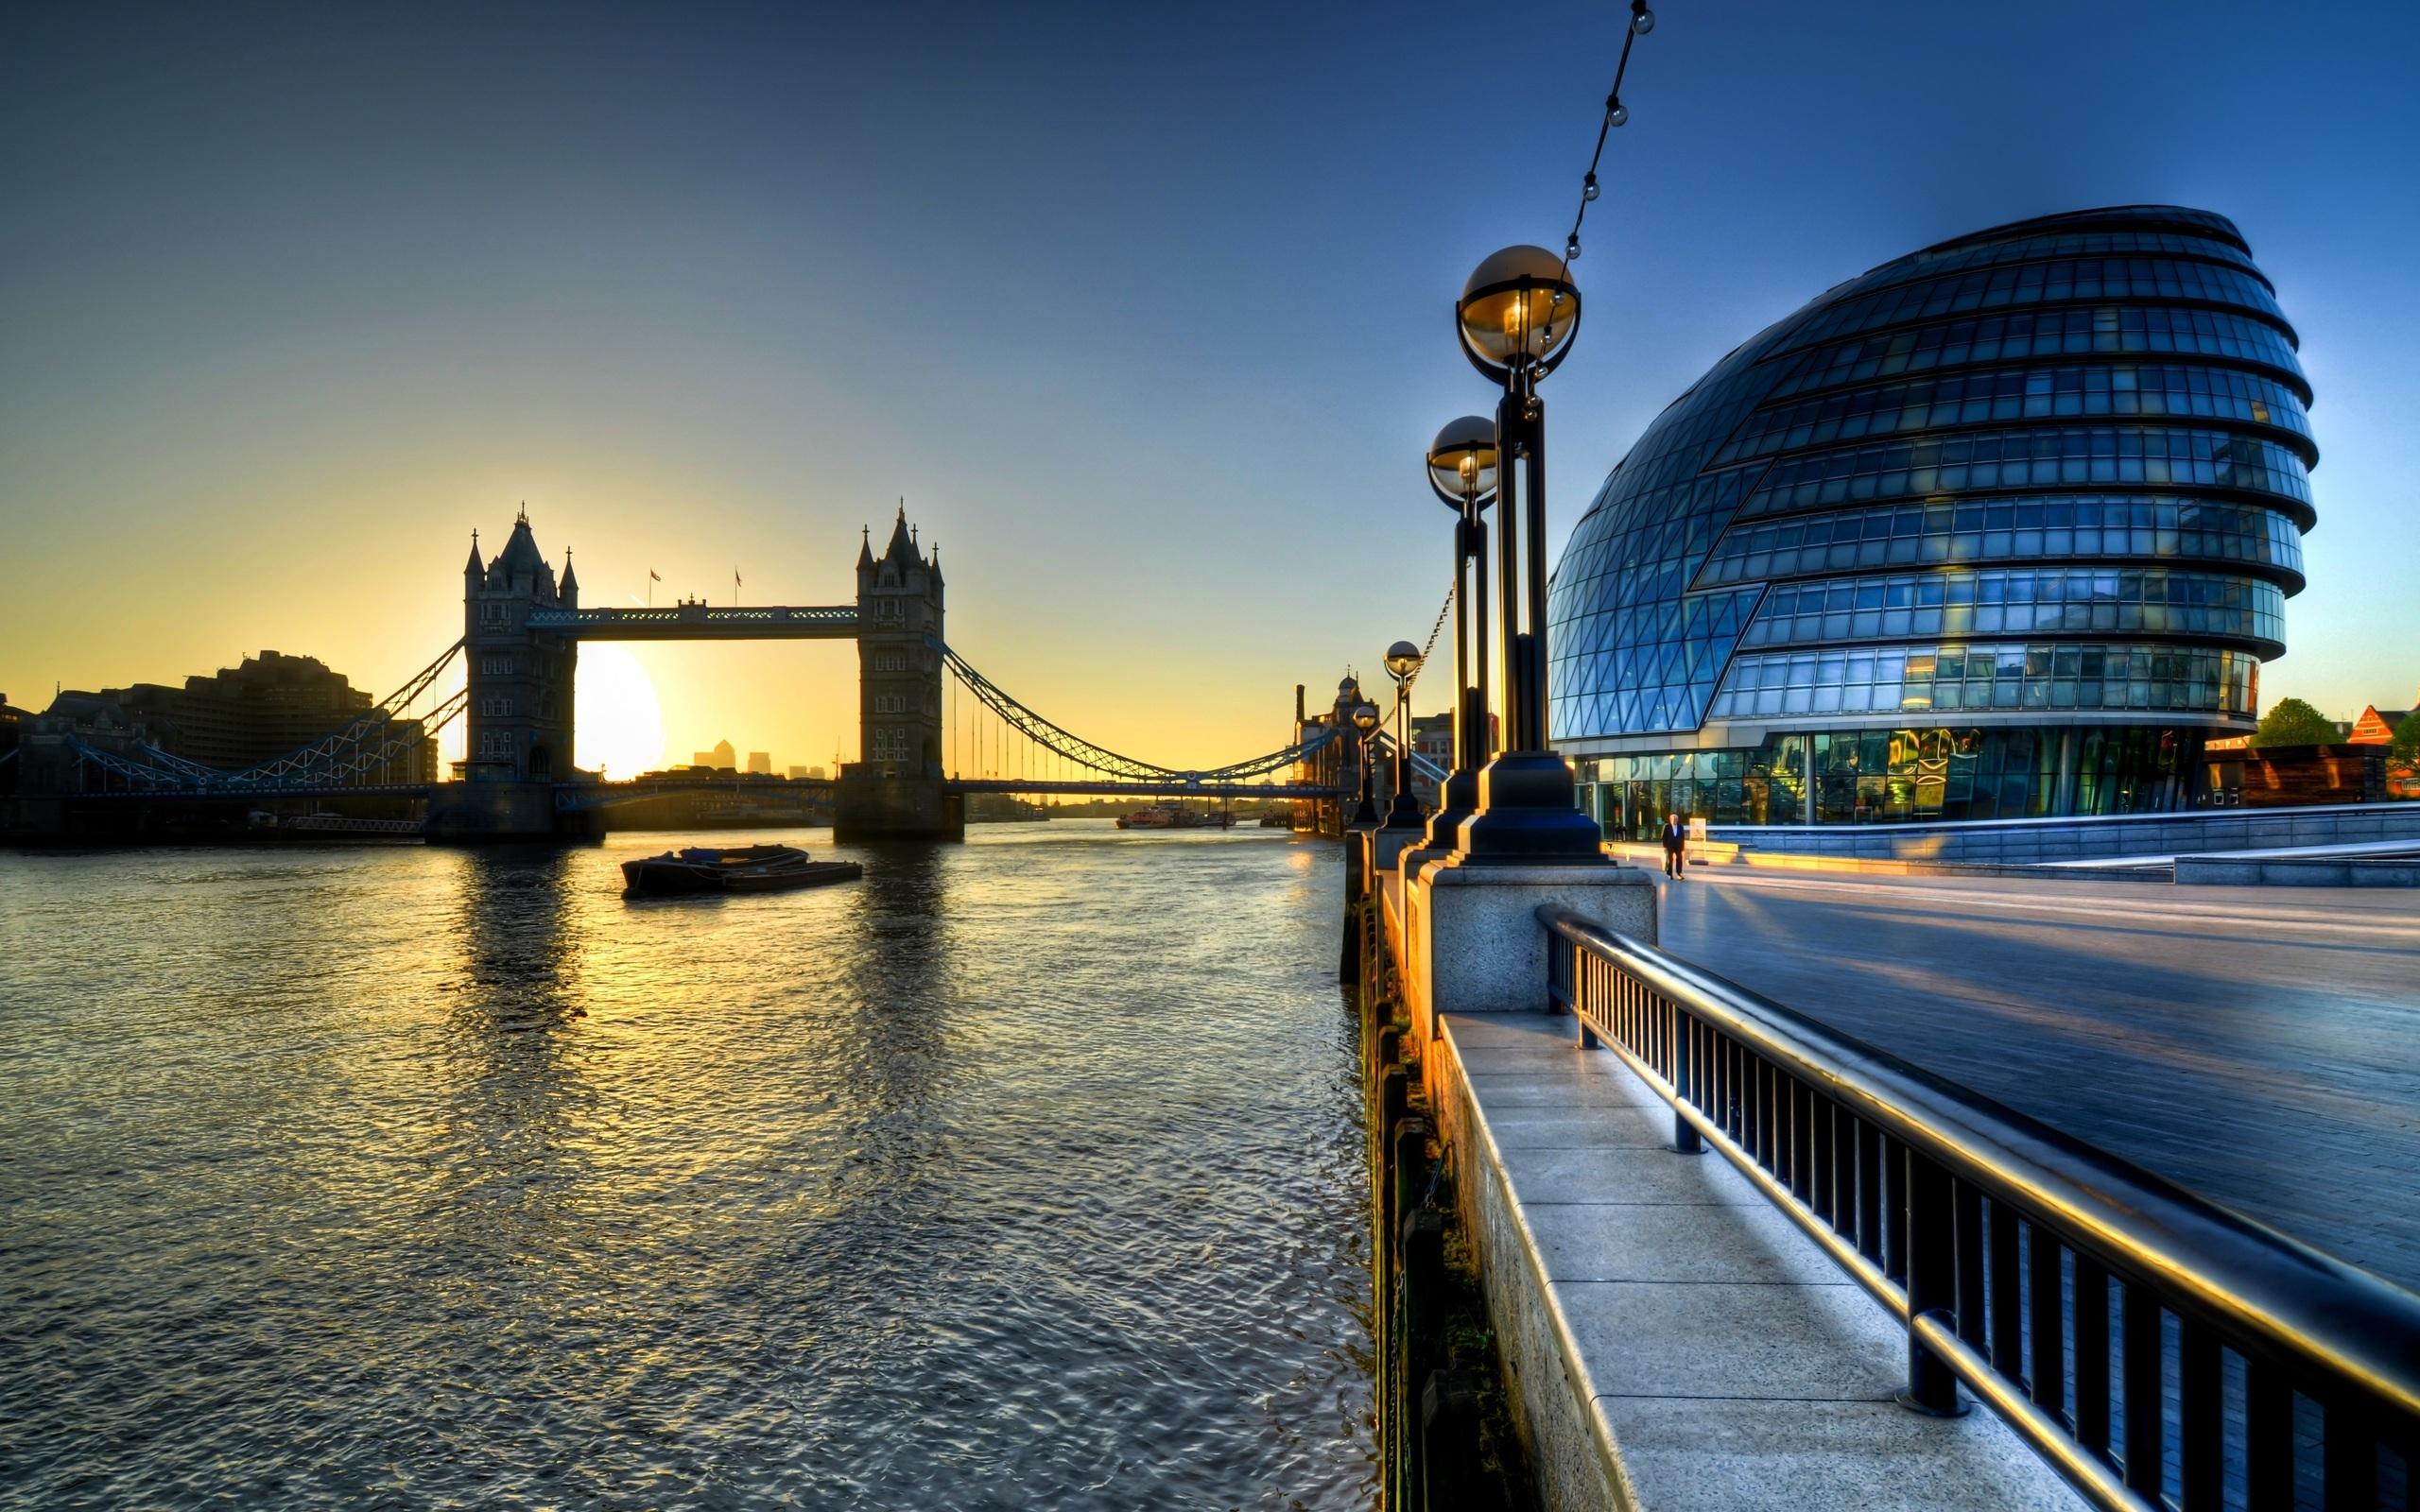 London View Wallpaper View of Tower Bridge